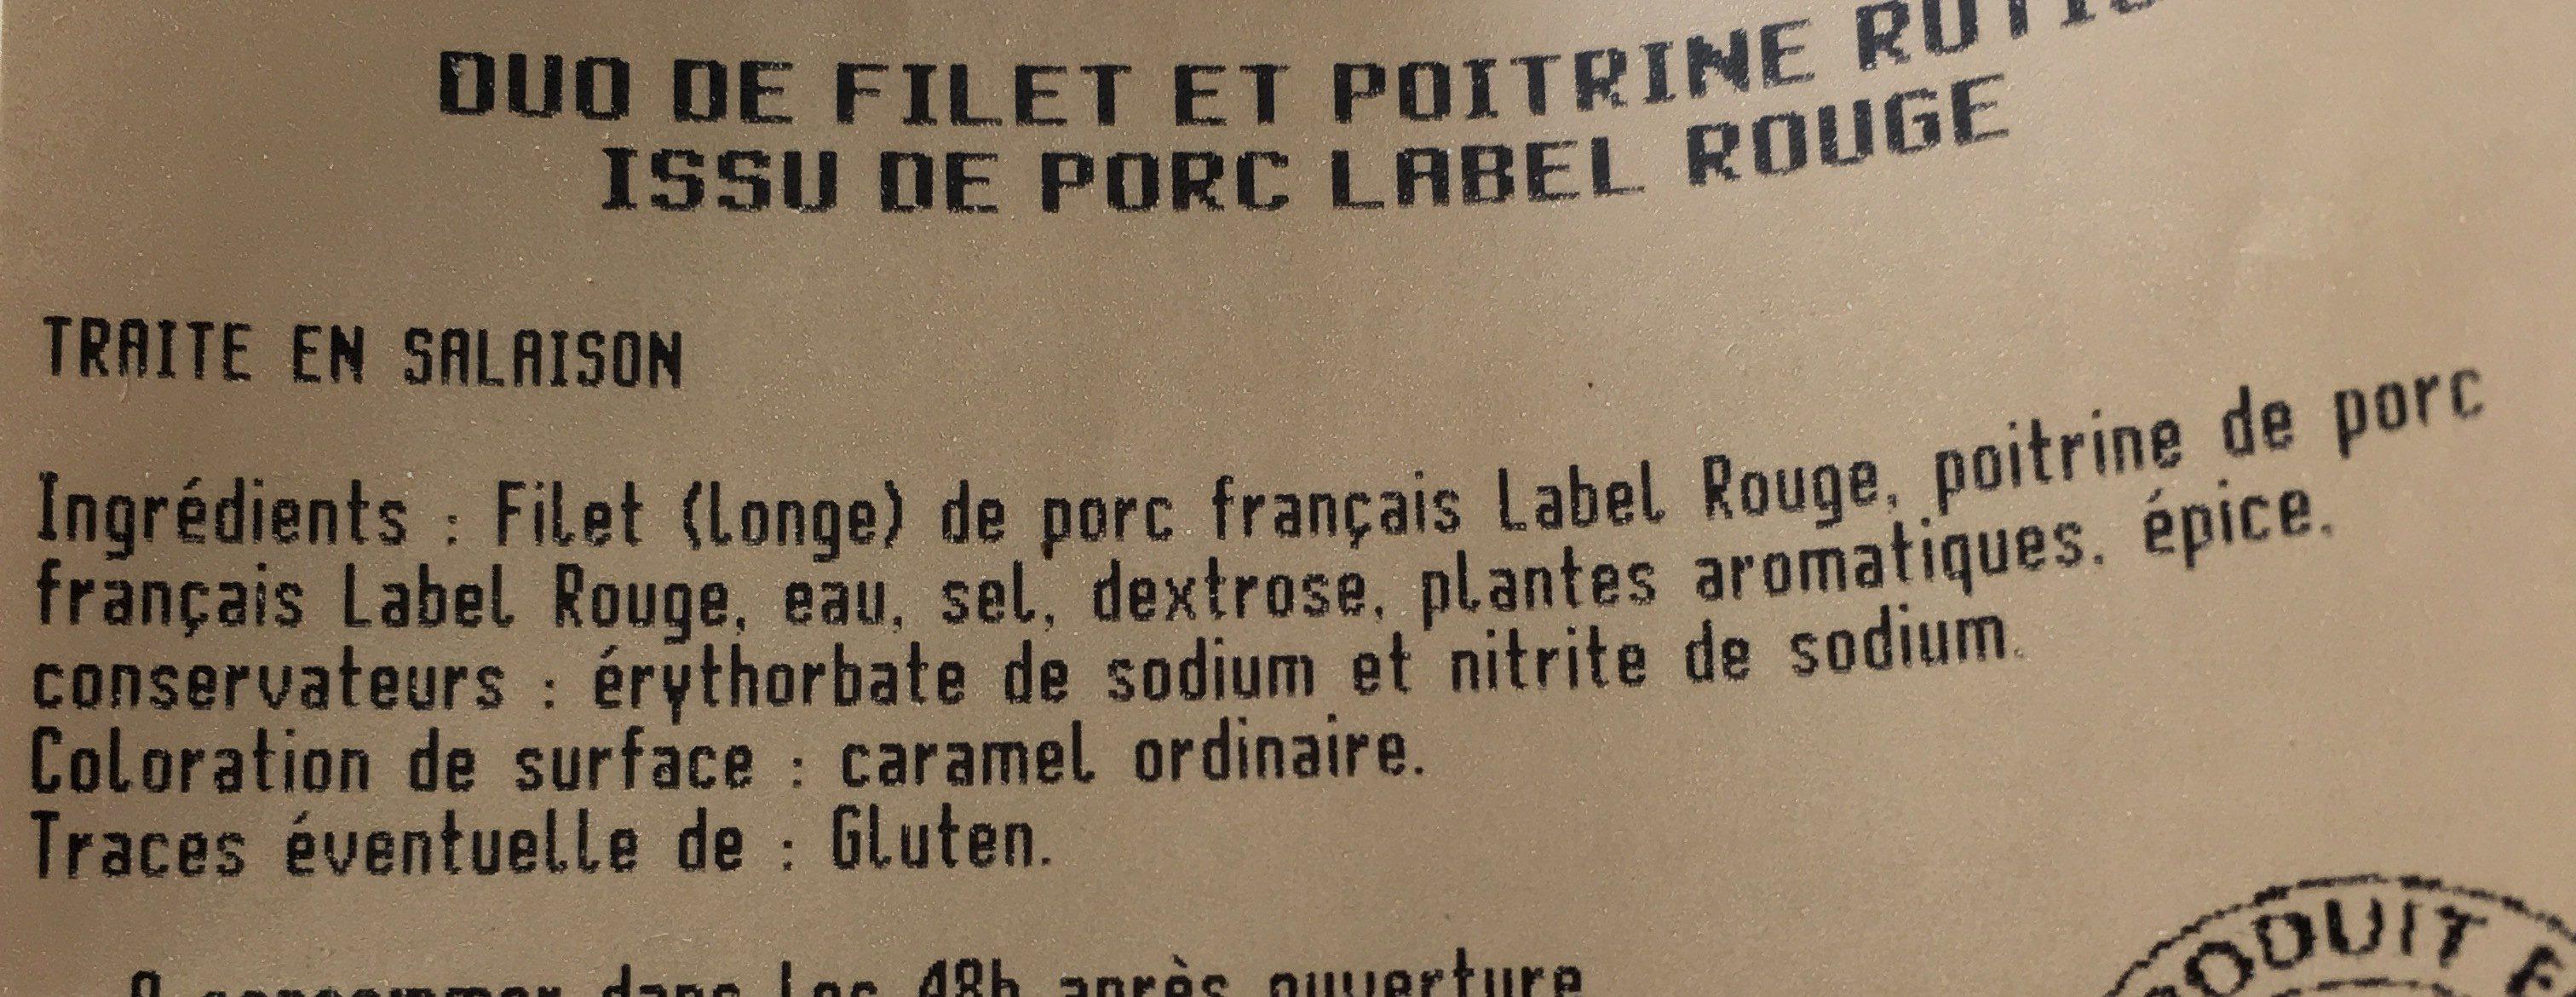 Duo de filet et poitrine - Ingrediënten - fr